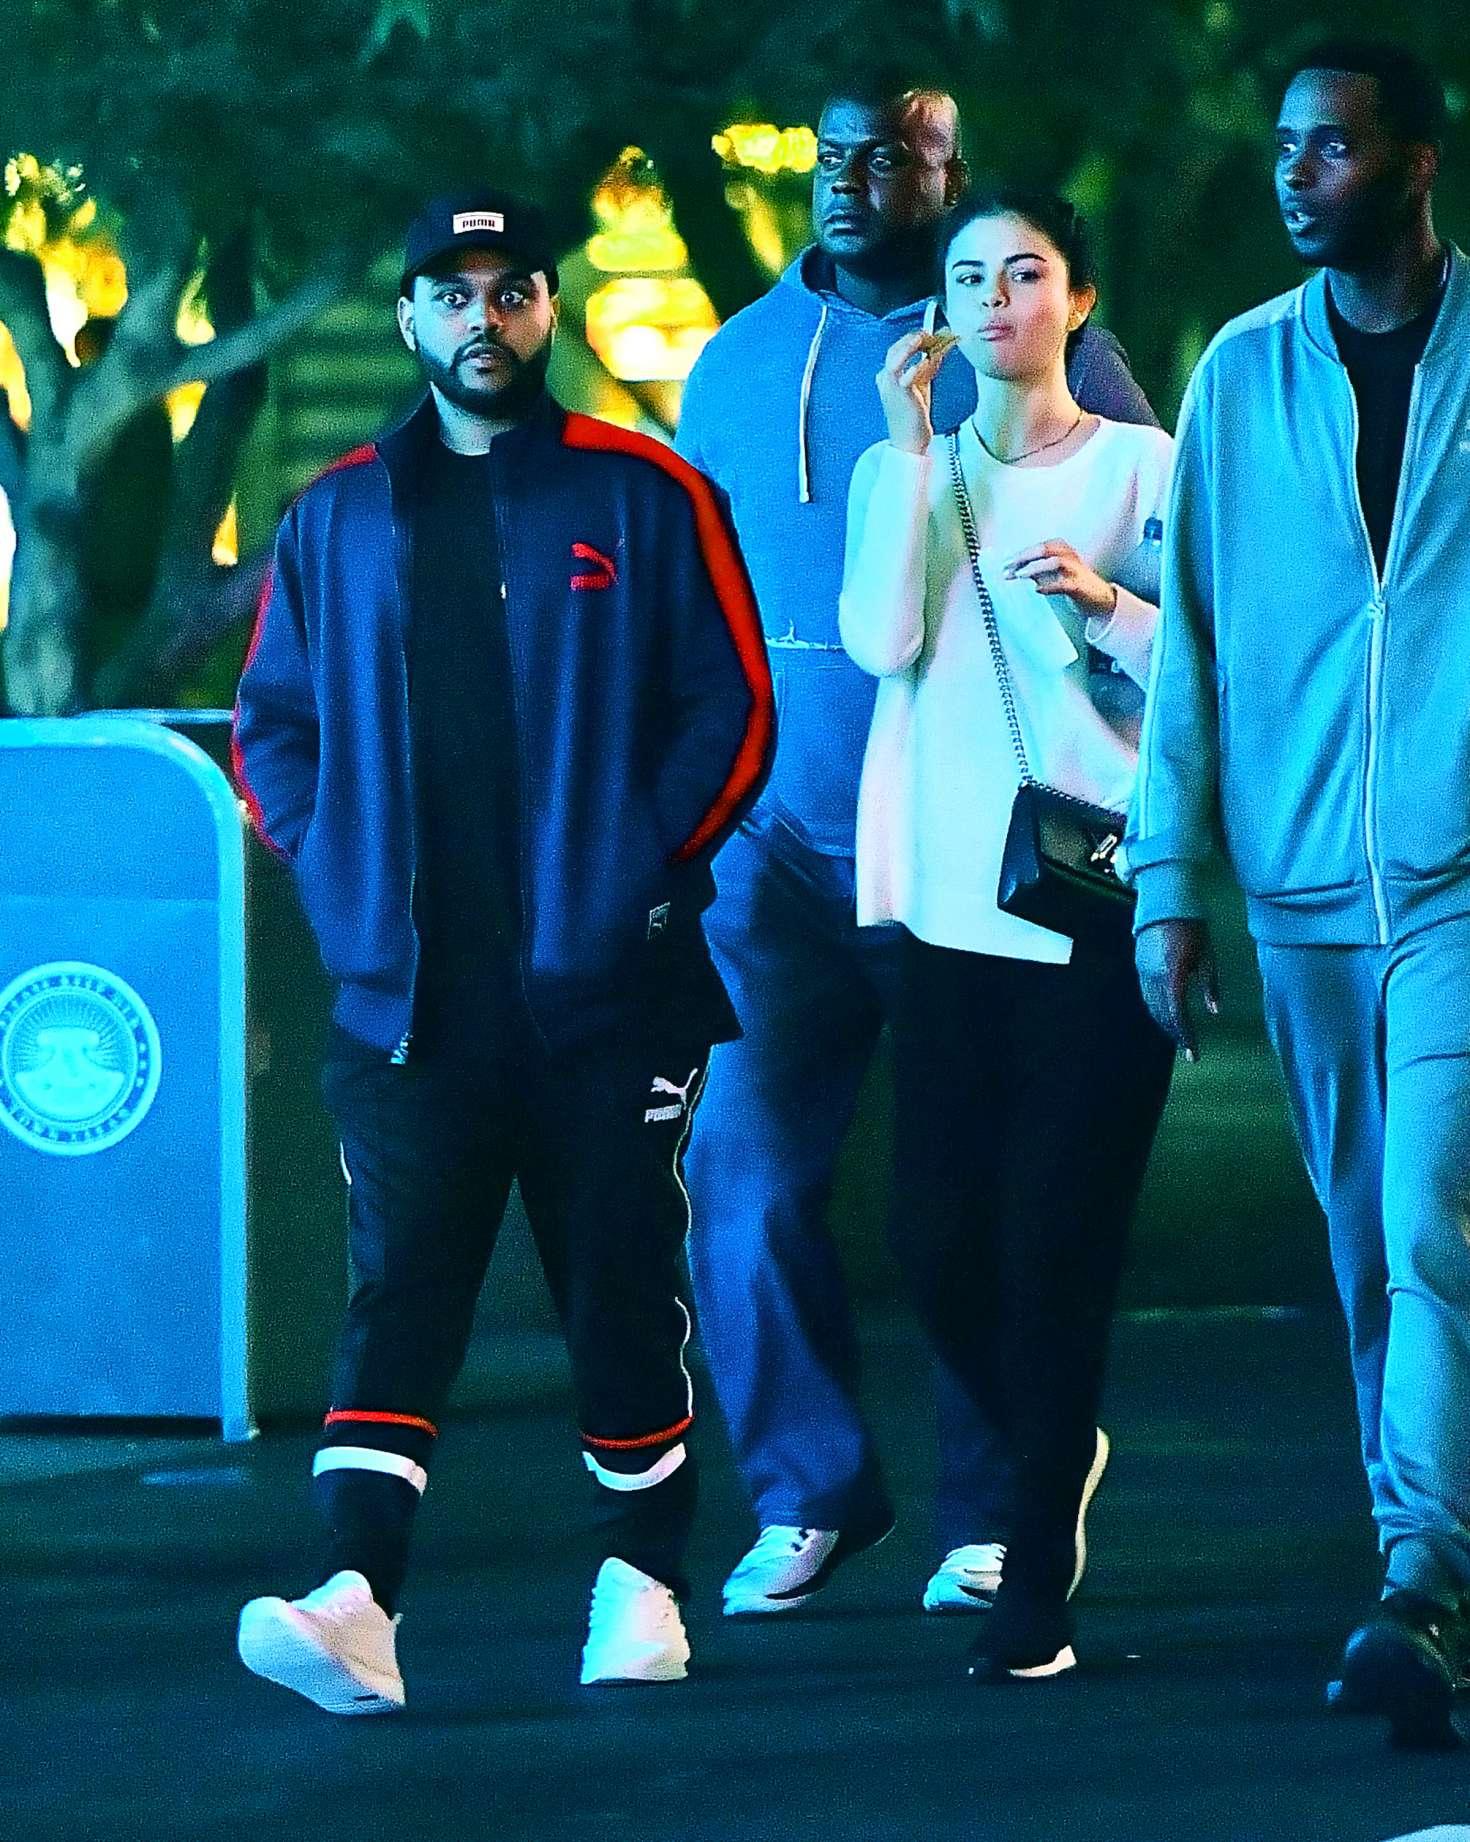 Selena Gomez 2017 : Selena Gomez and The Weeknd at Disneyland -33